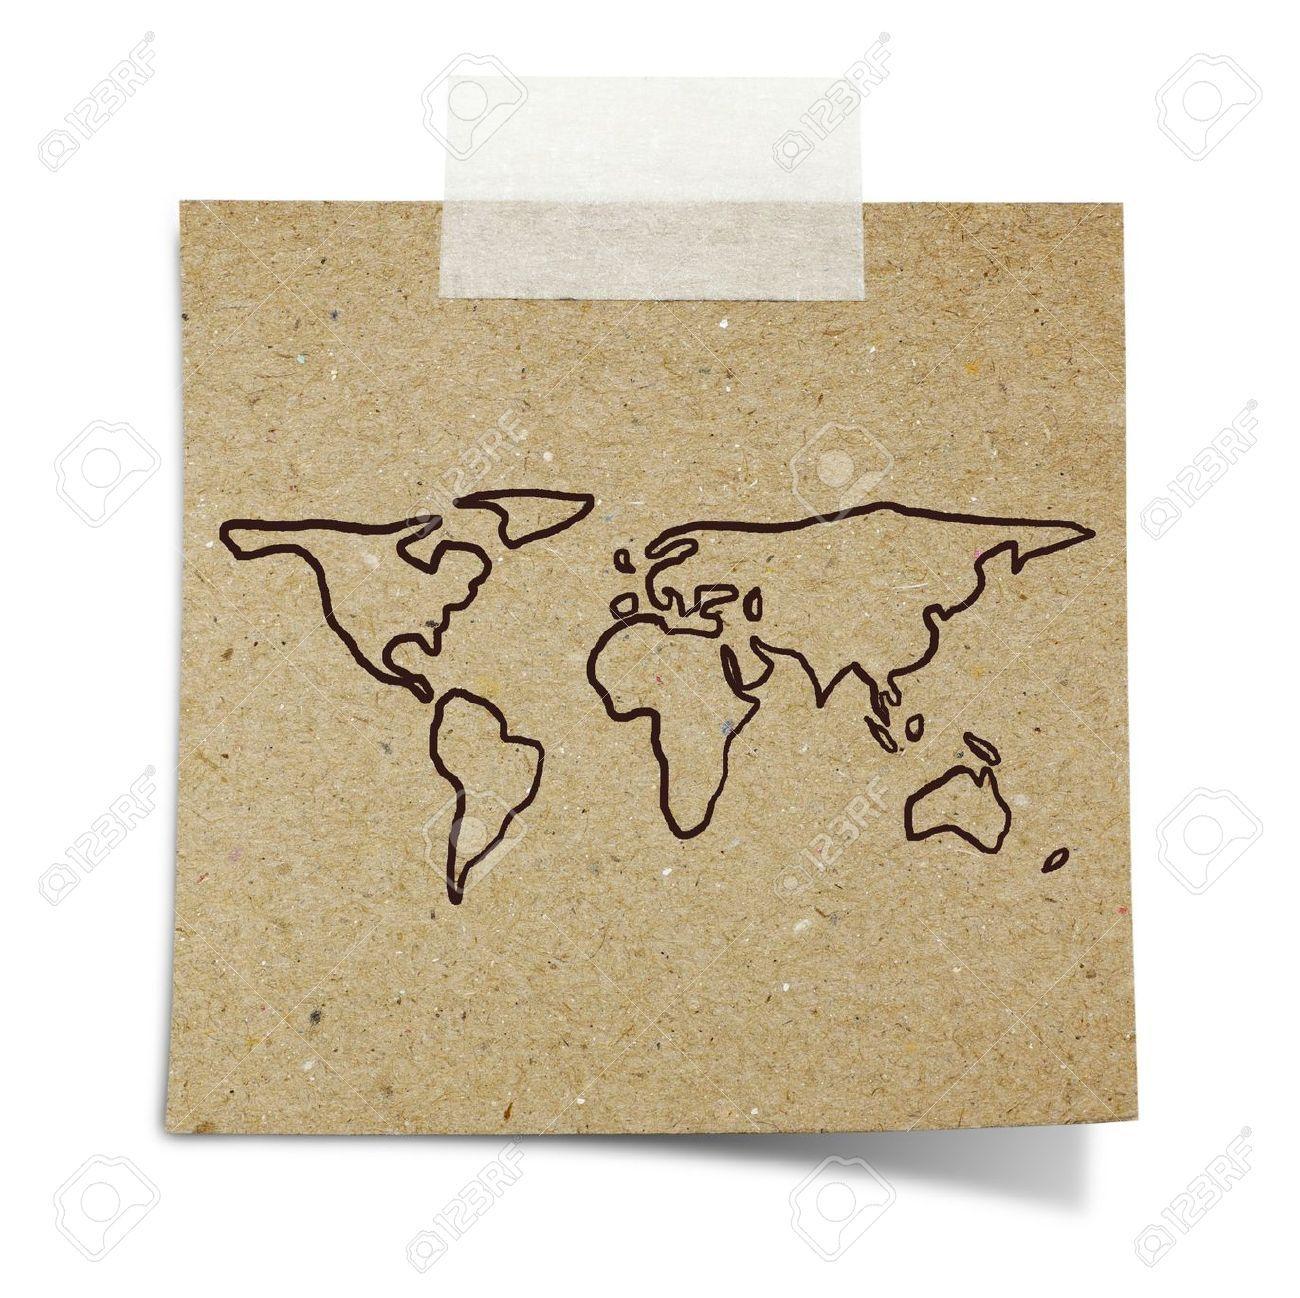 Vintage world map stock vector illustration and royalty free vintage world map stock vector illustration and royalty free gumiabroncs Image collections